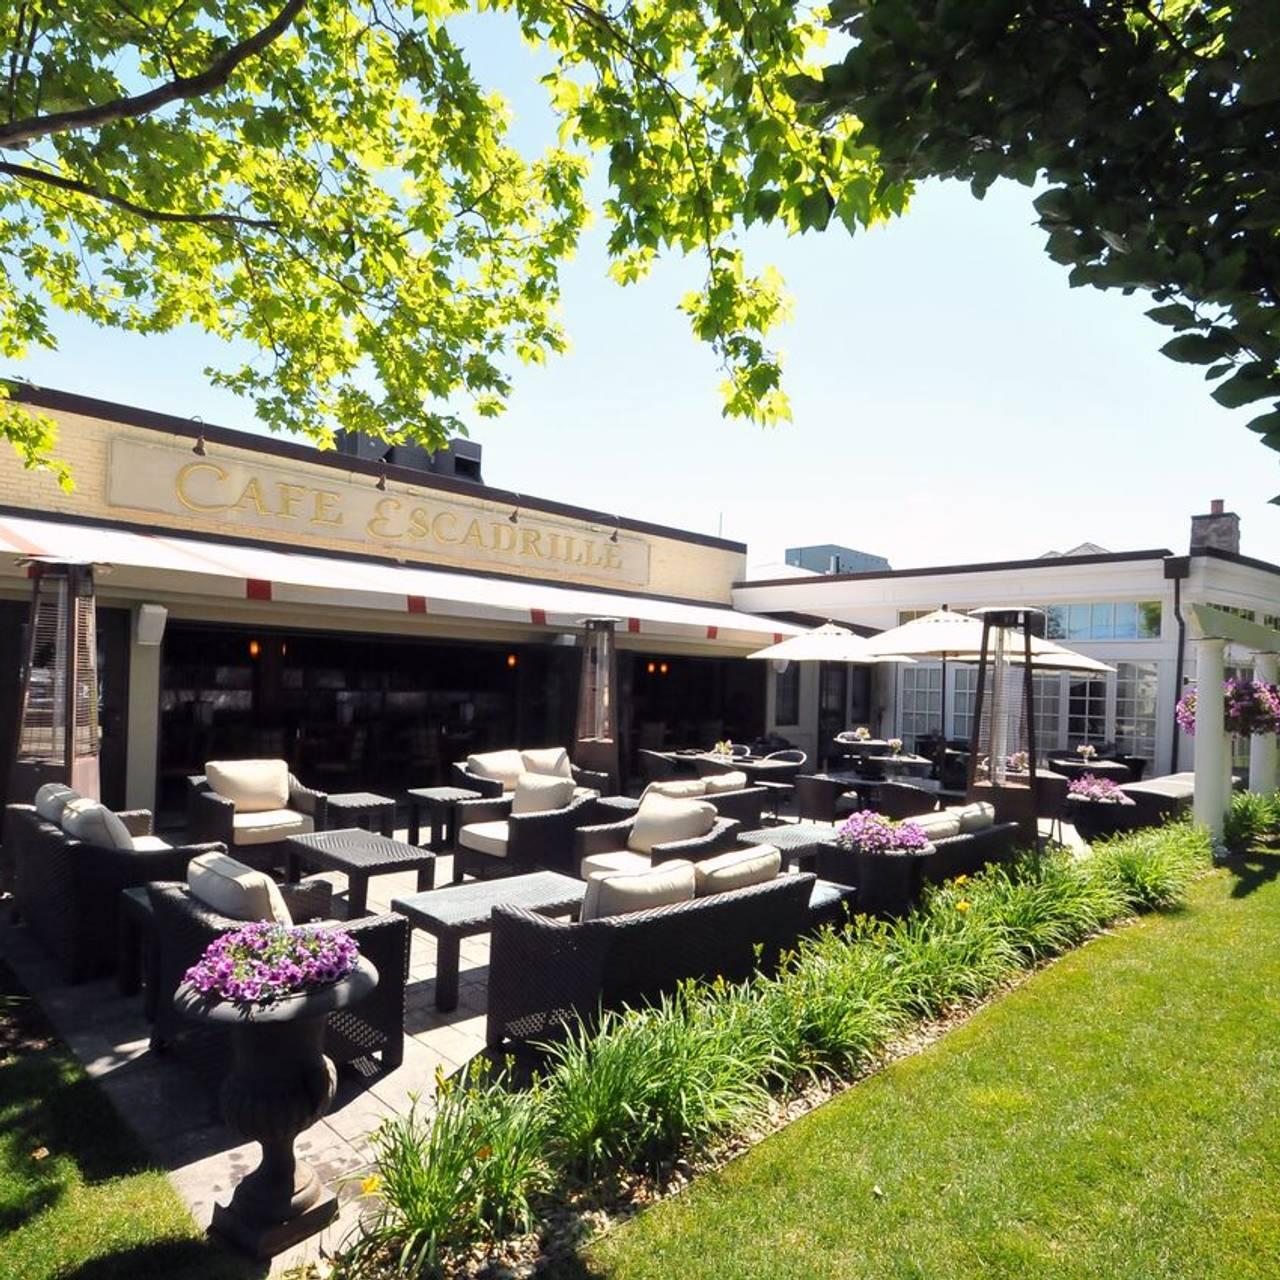 Cafe Escadrille Restaurant Burlington Ma Opentable Goats Dont Lie Tea Tree 300 Ml